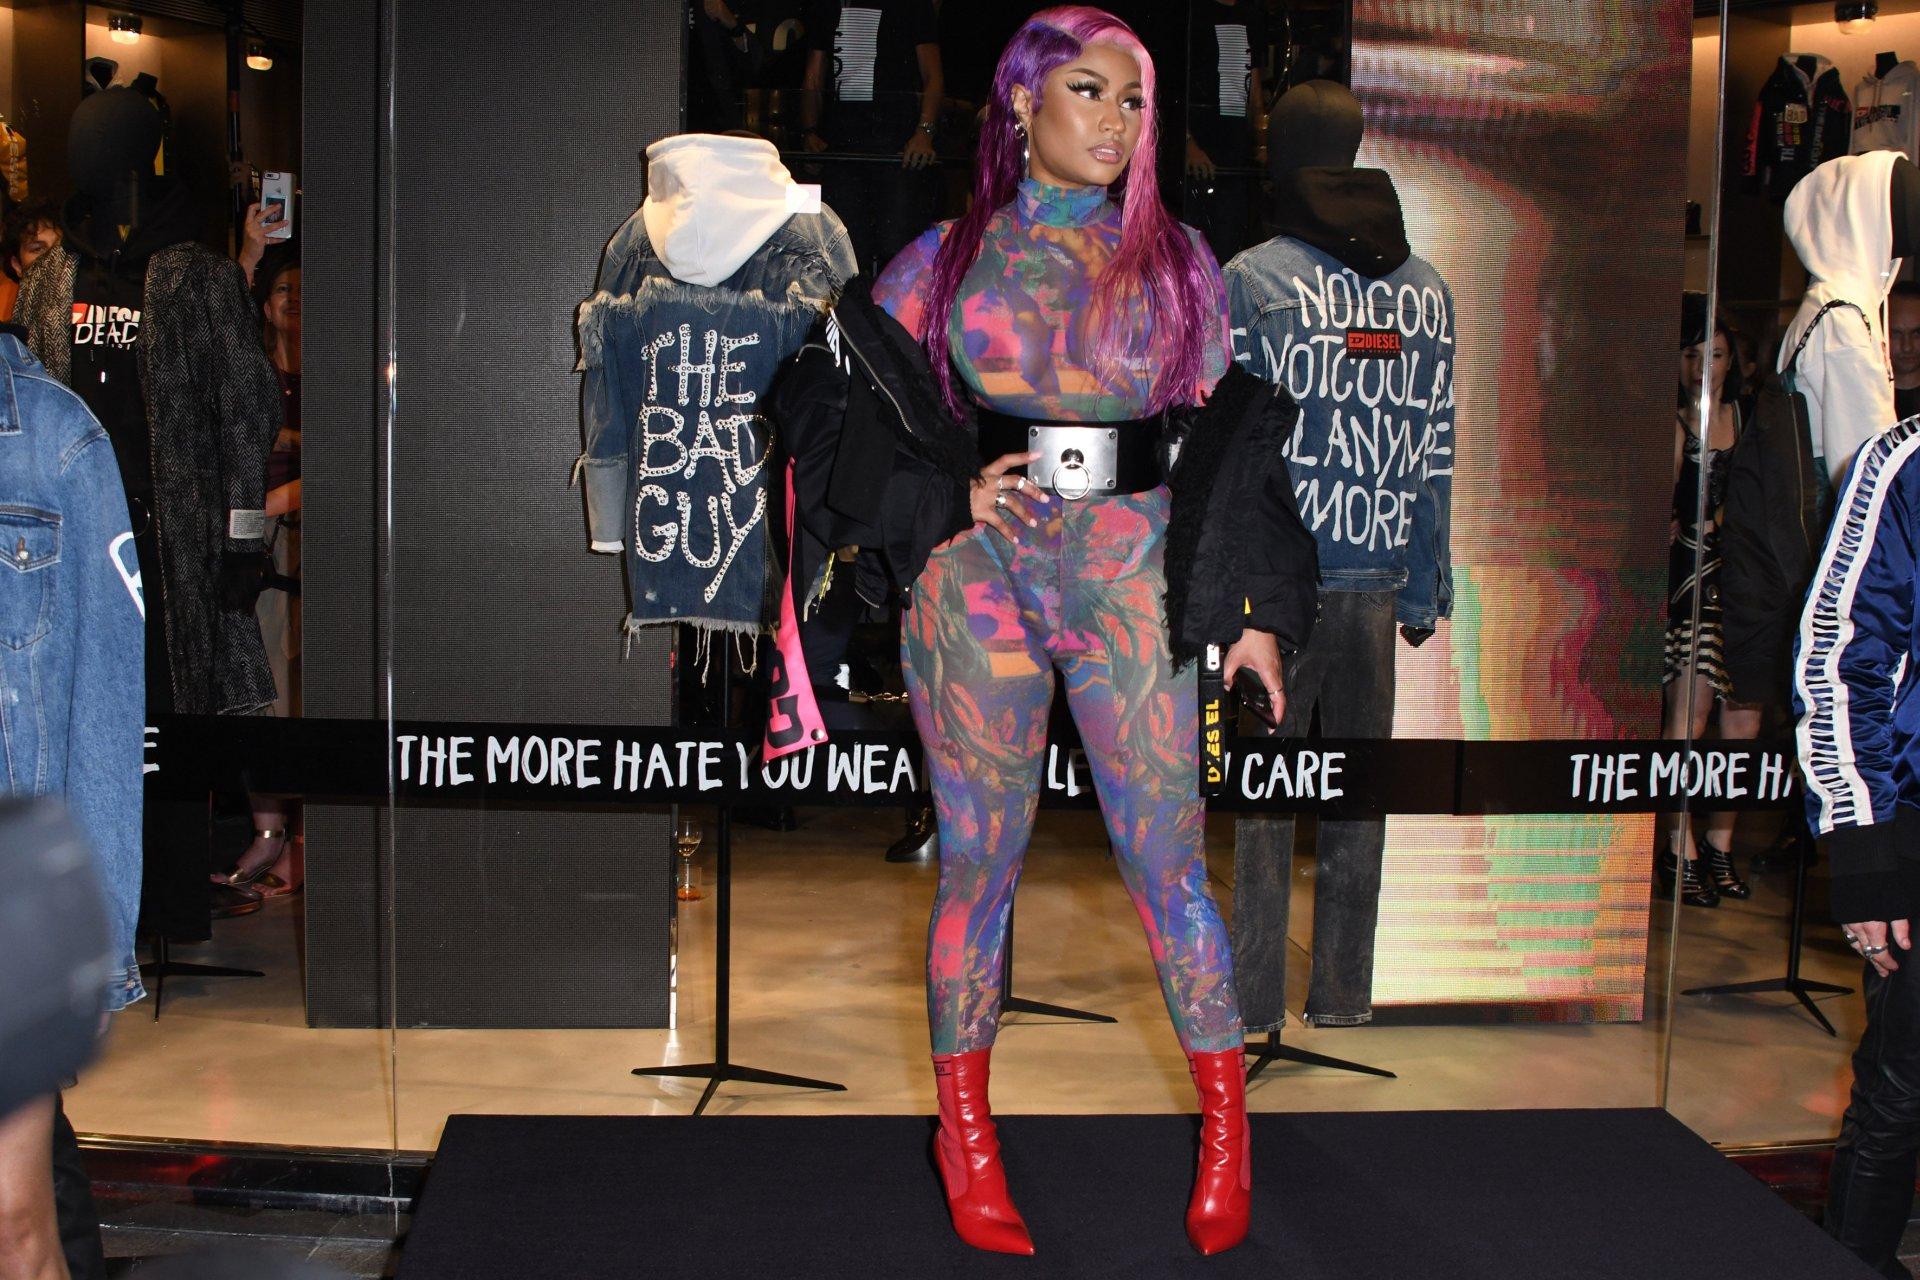 Nicki-Minaj-See-Through-TheFappeningBlog.com-26.jpg